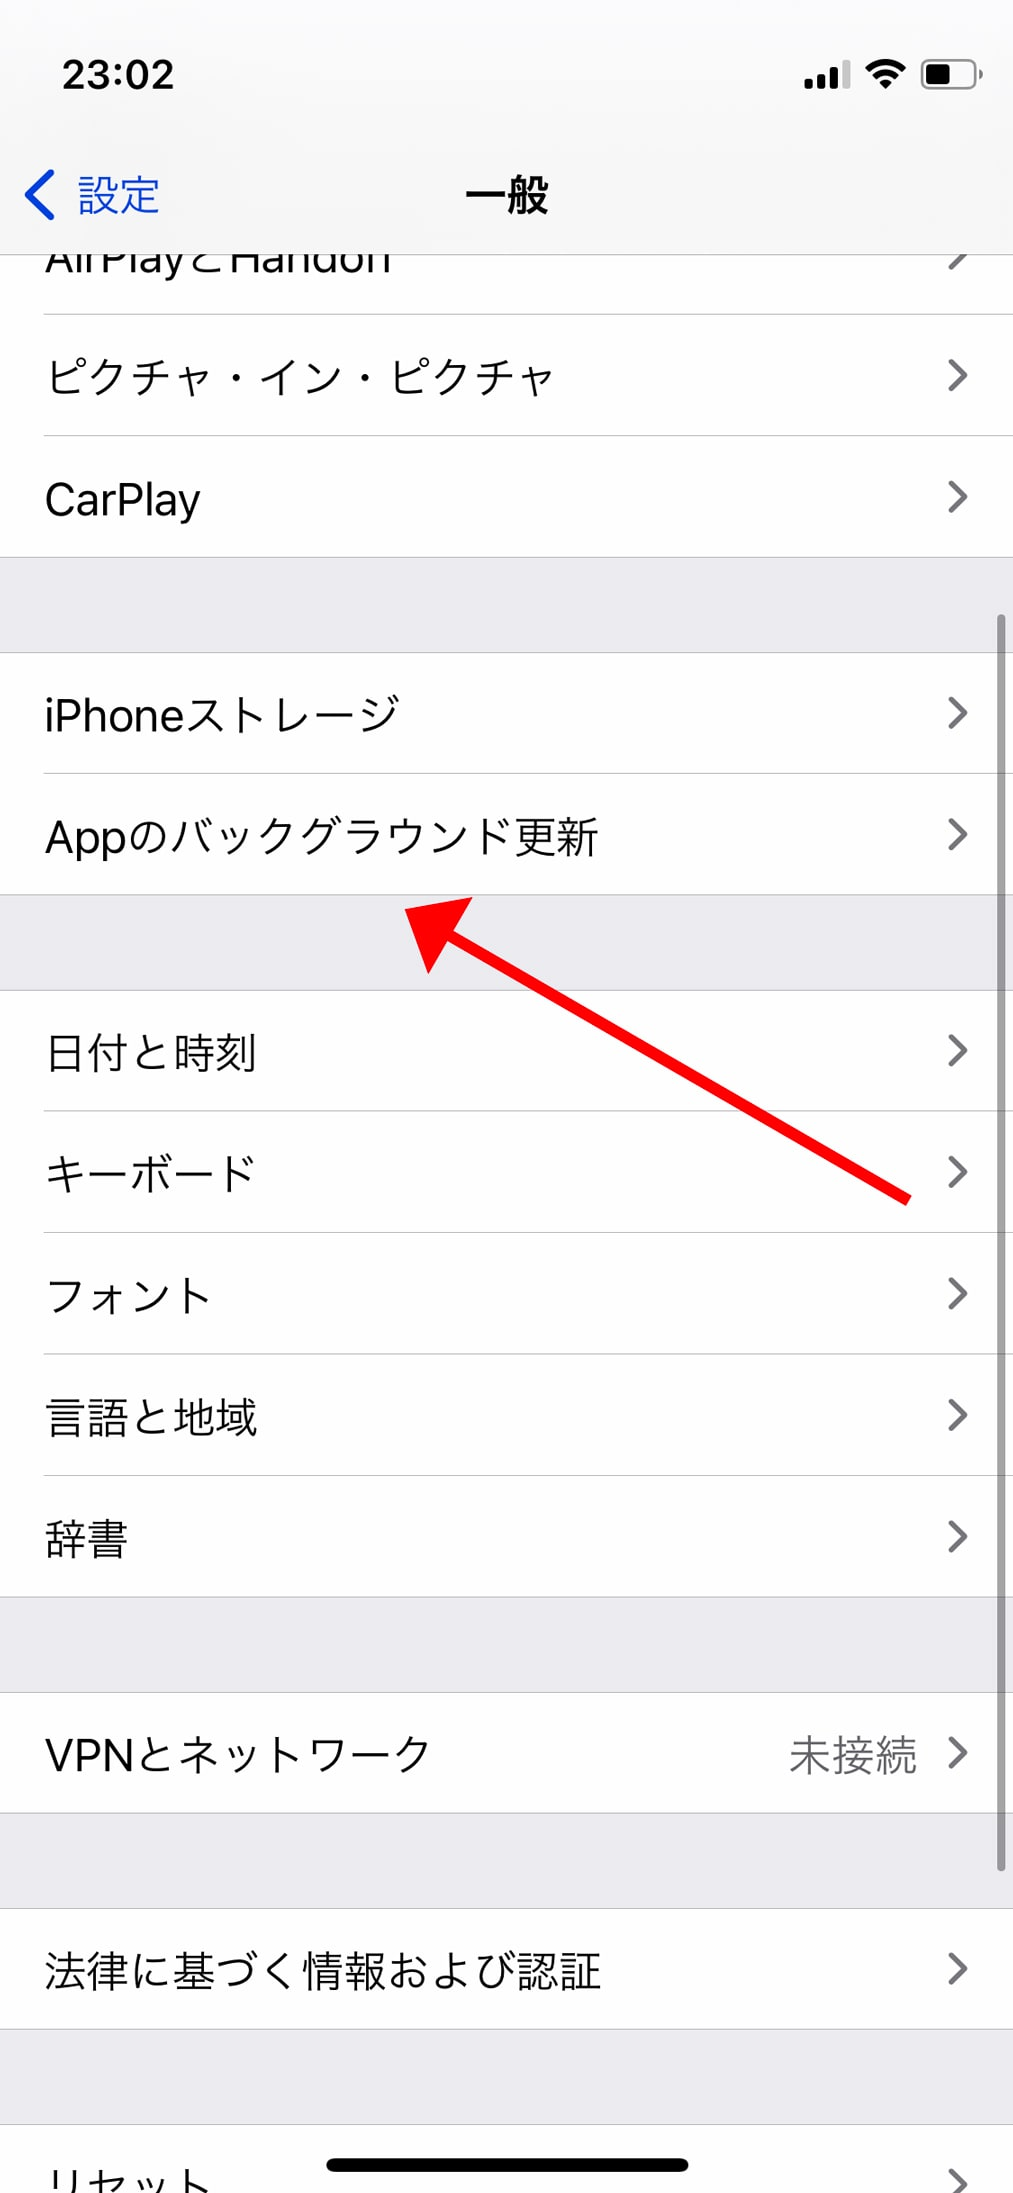 Appのバックグラウンド更新の設定を変えてiPhoneのデータ通信を節約する方法